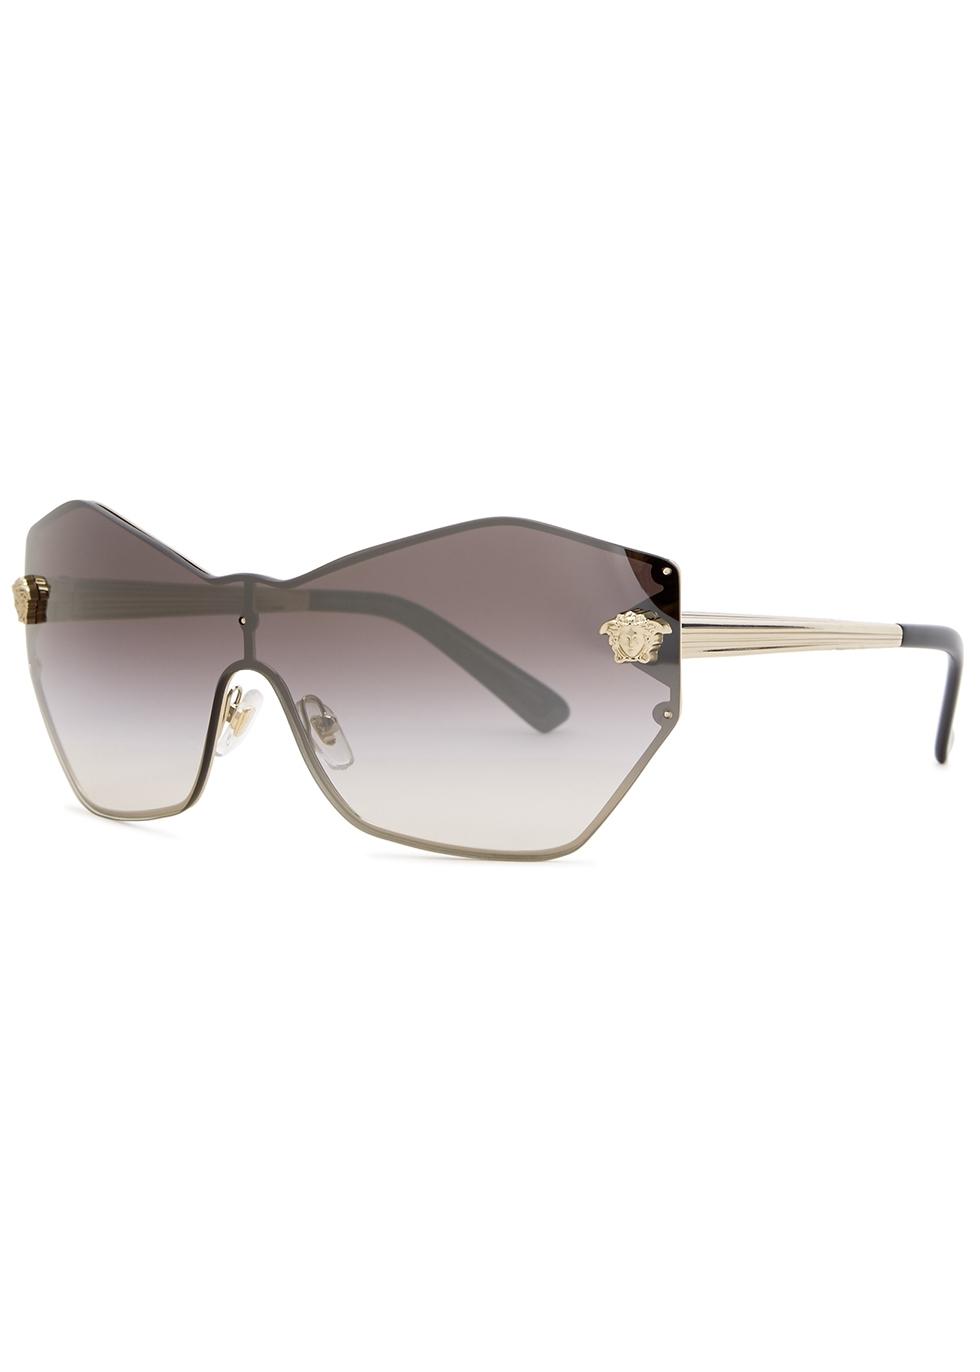 86d21e70187d Women s Designer Sunglasses and Eyewear - Harvey Nichols